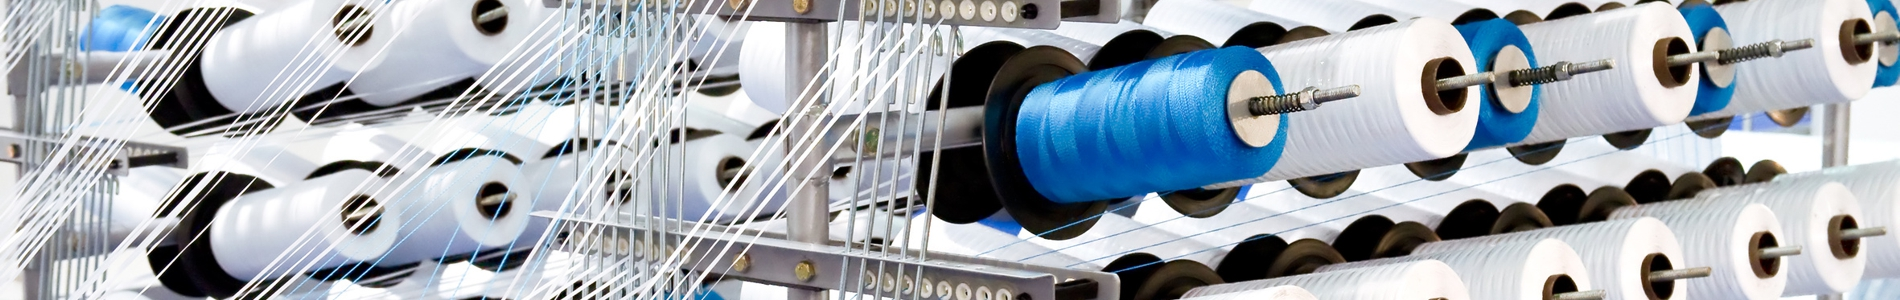 Textilindustrie / Textile Industry